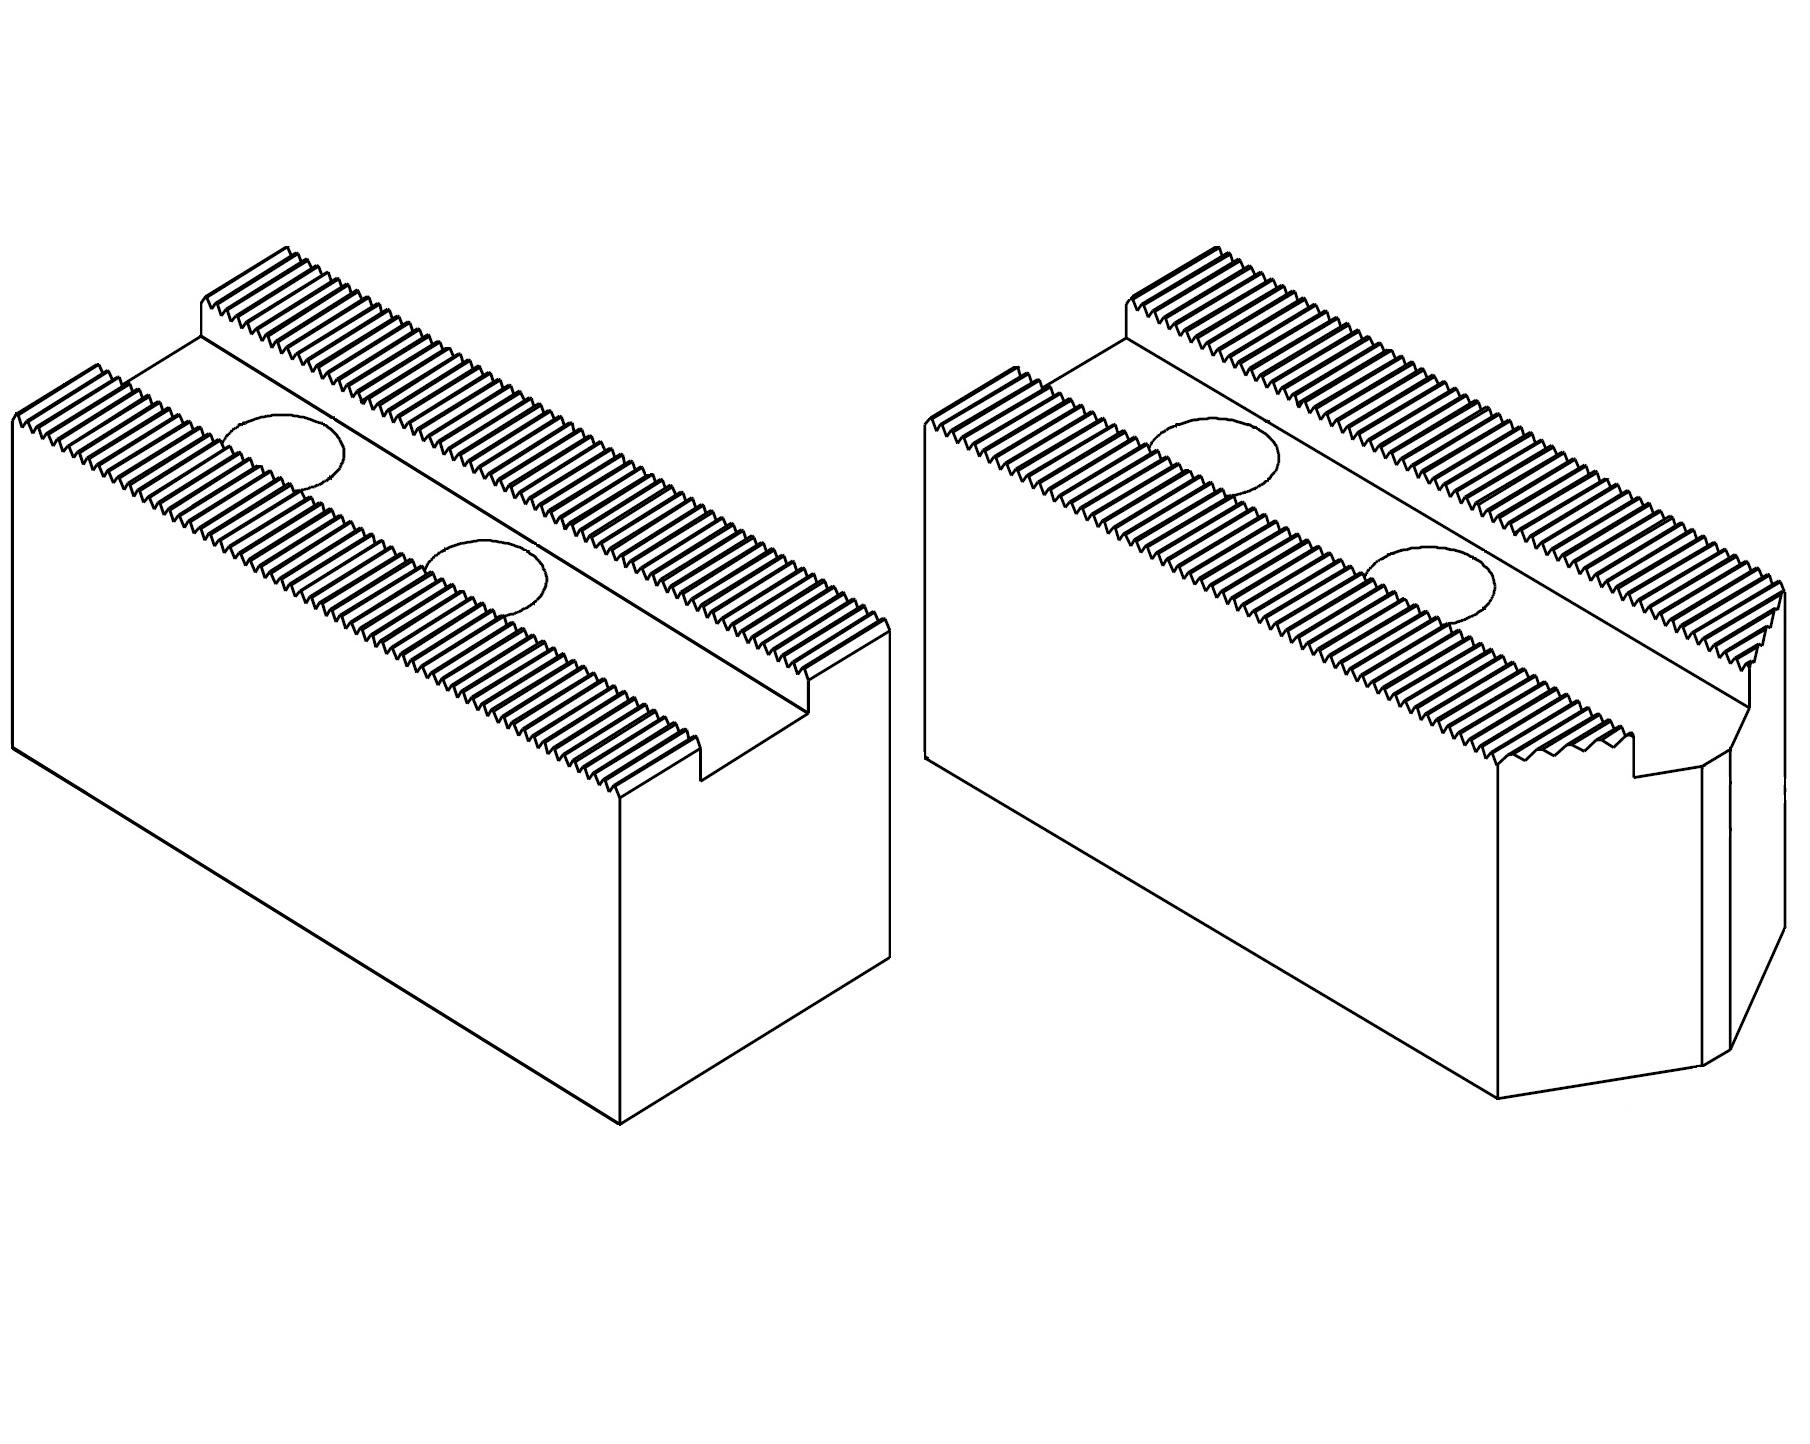 Čelisti měkké 1,5x60°, šířka drážky - 10 (sklíčidla pr. 100-135mm)